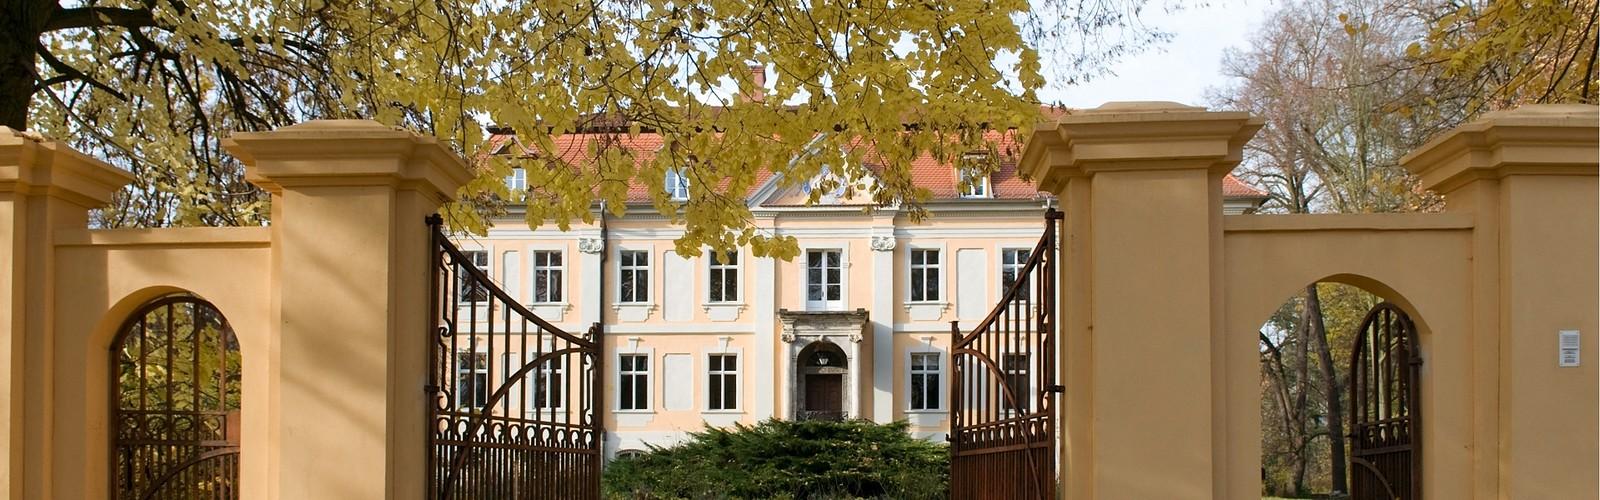 Welcome to Stülpe Castle, Foto: Barbara Rupilius